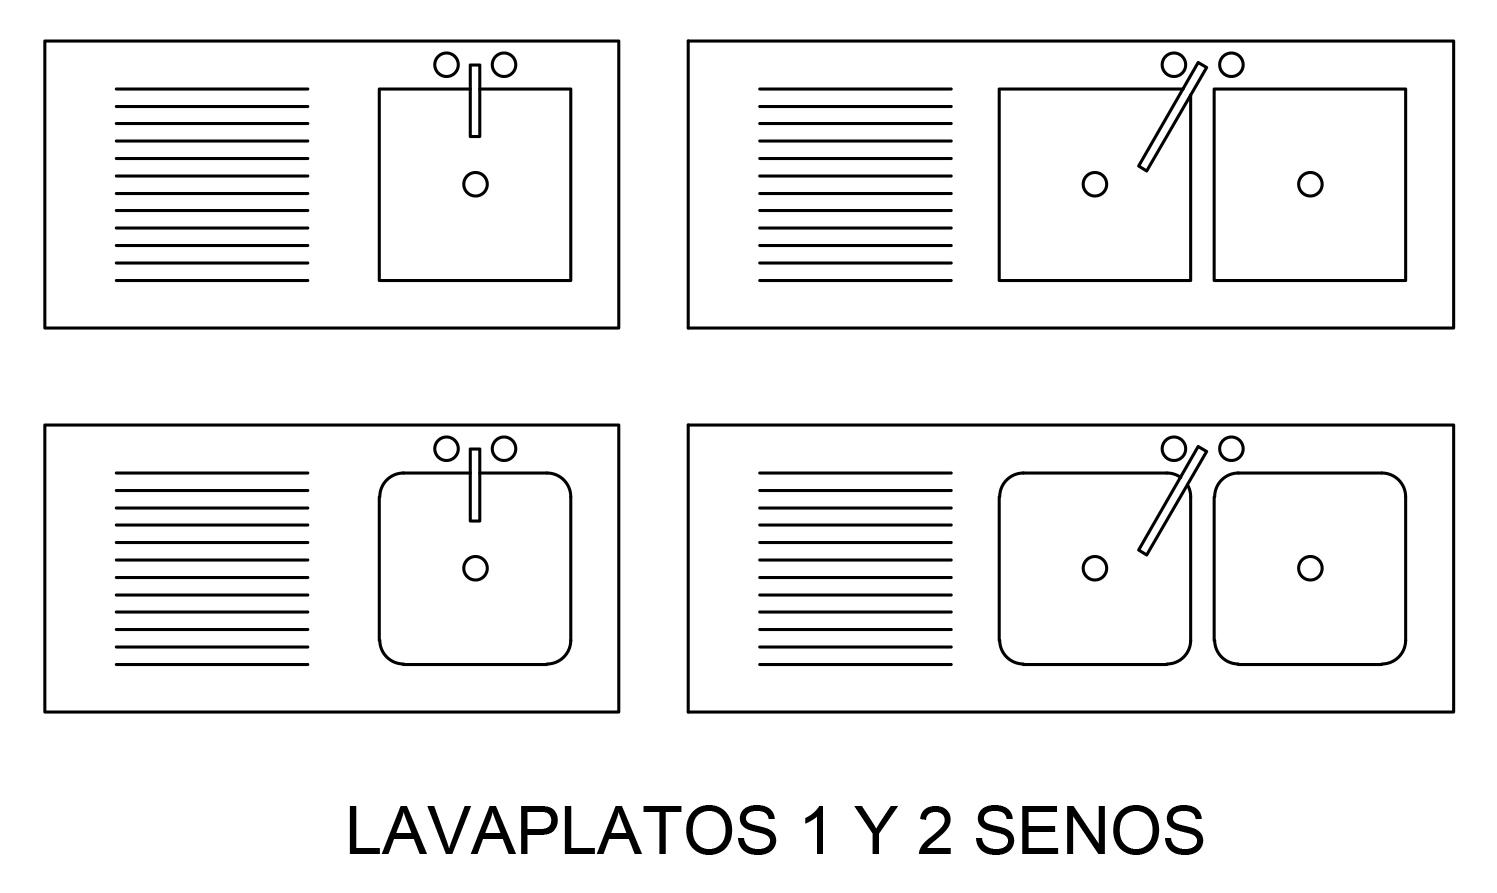 representacion de lavaplatos en plano arquitectonica